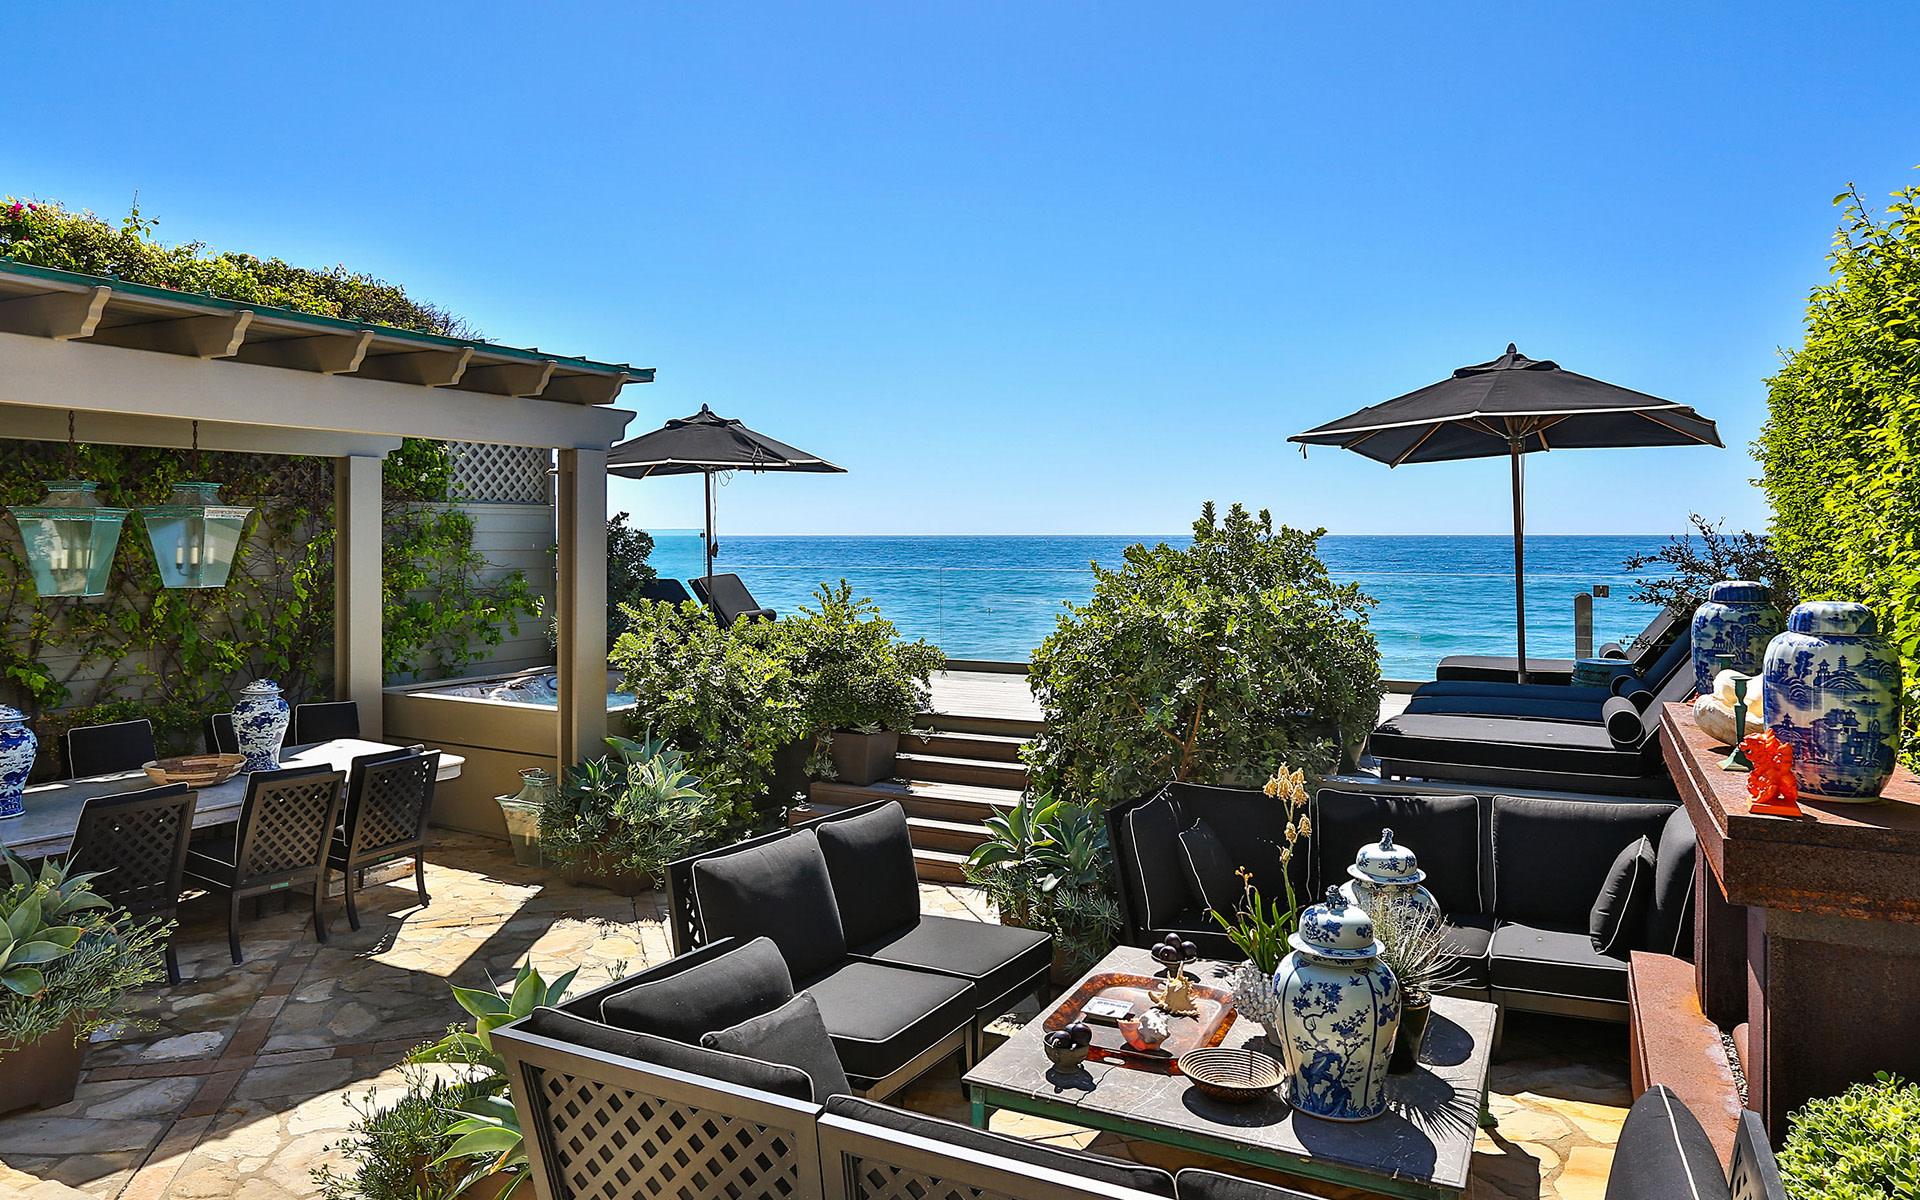 Single Family Home for Sale at 23618 Malibu Colony Rd #56 23618 Malibu Colony Rd #56 Malibu, California,90265 United States